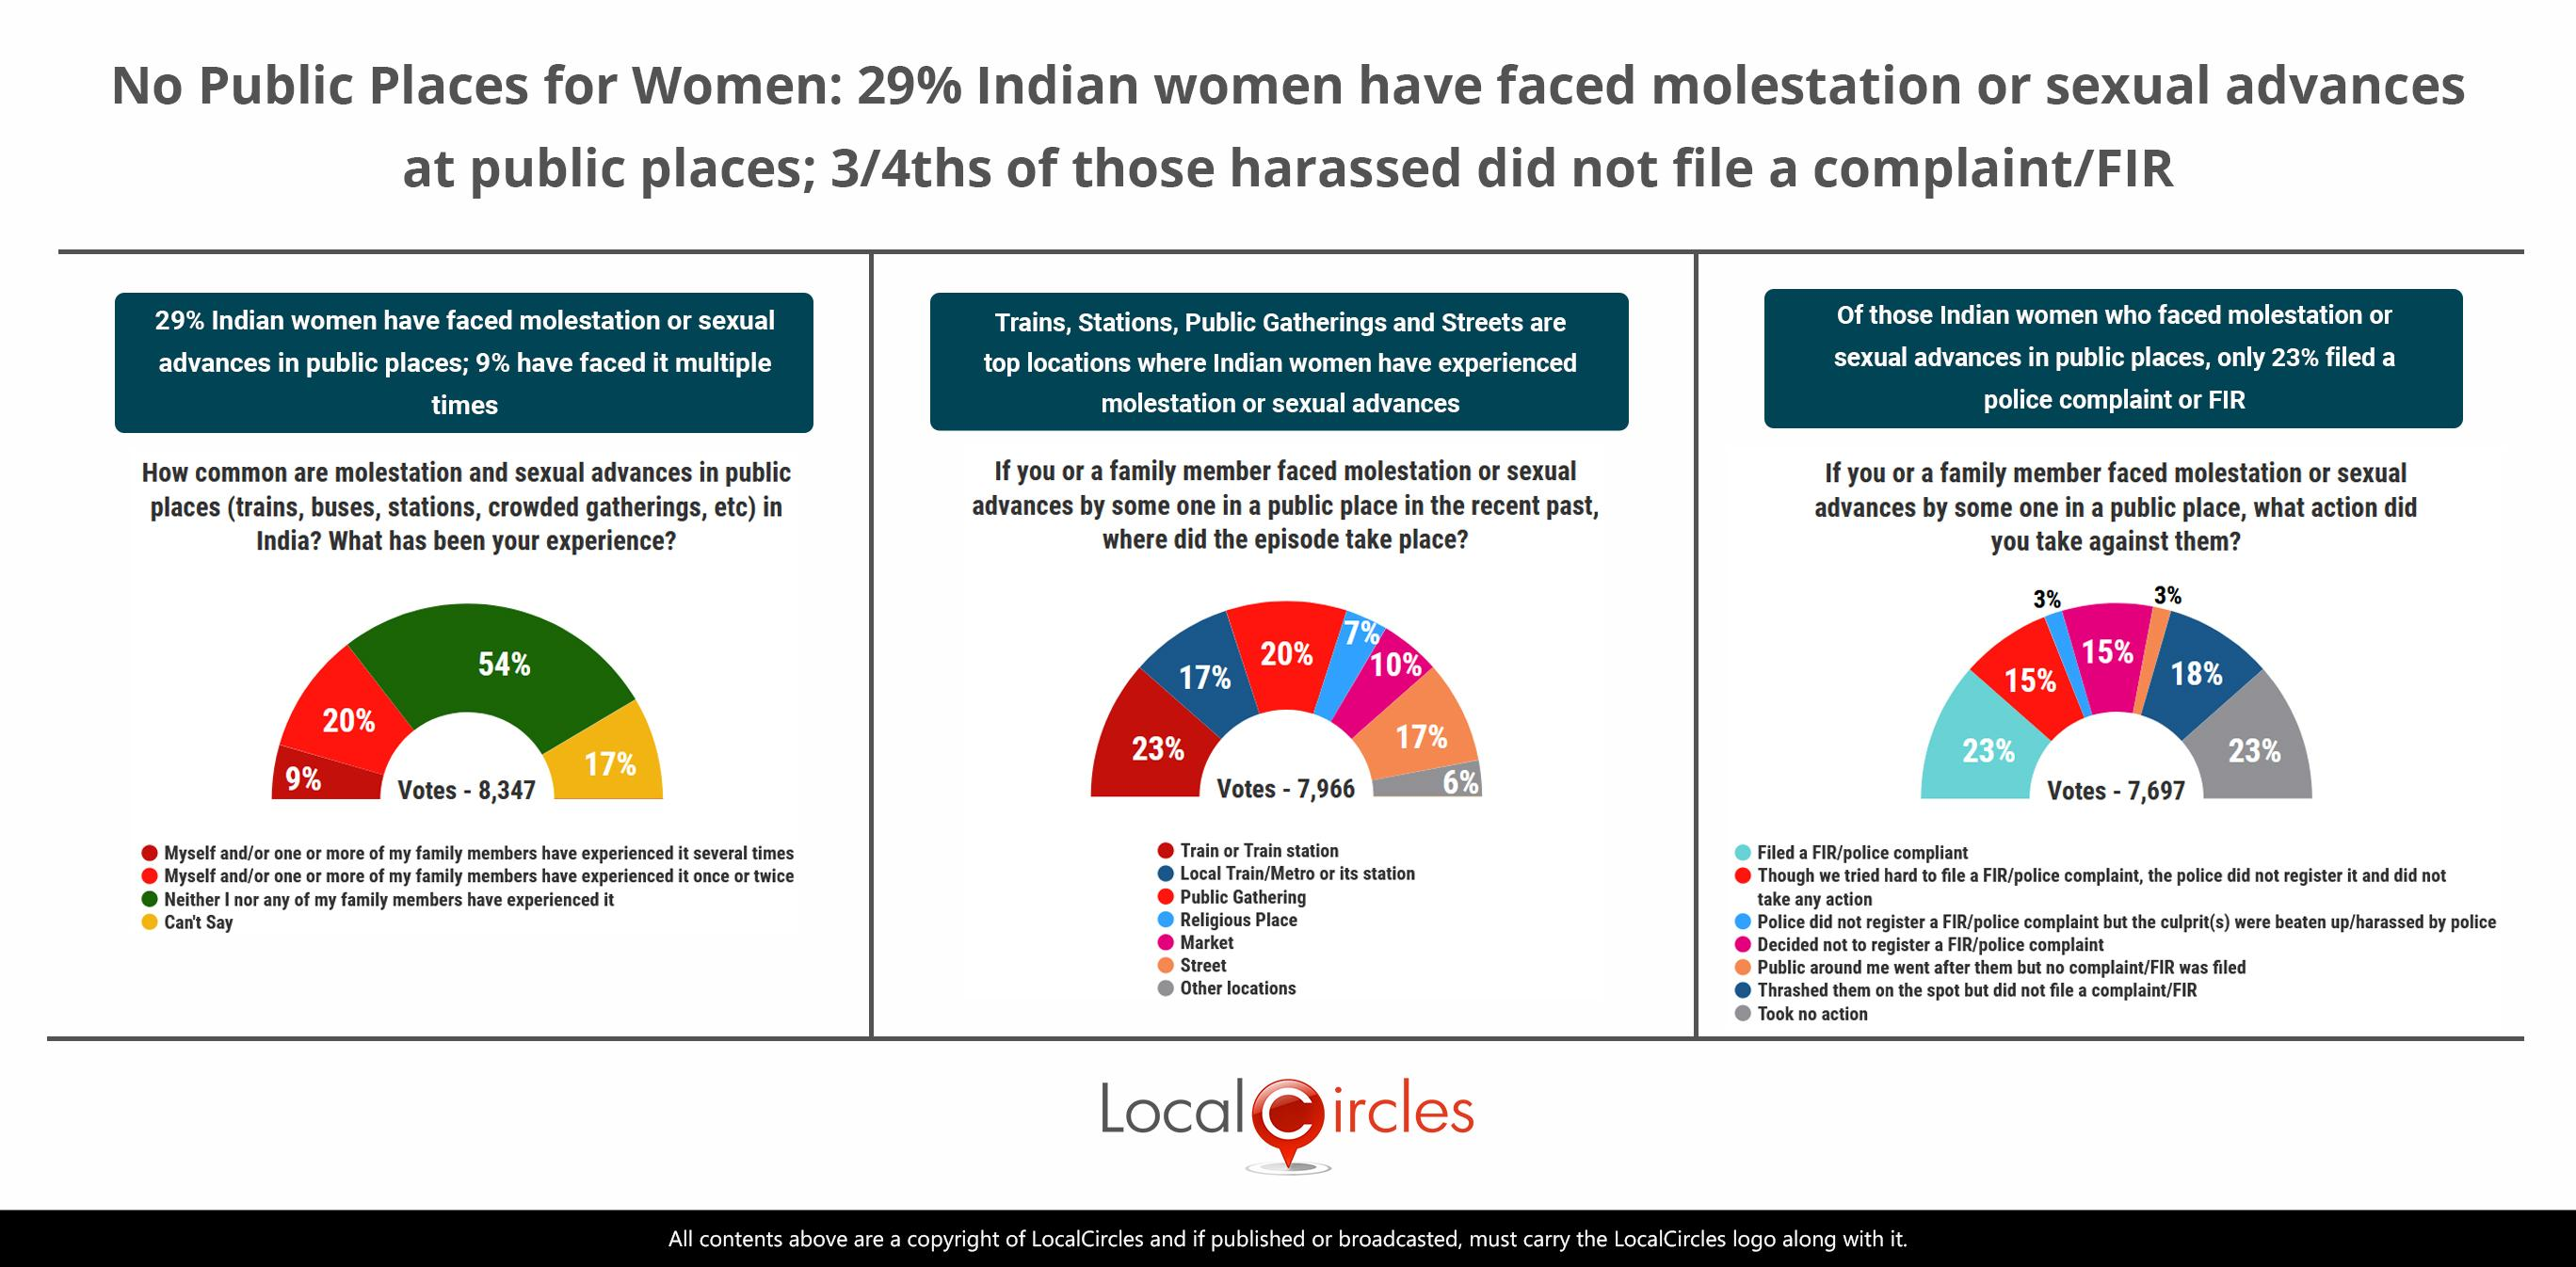 via_LocalCircles_Sexual_Harassment_Poll_-_20_Feb_2021_-_Summary___20210308123230___.jpg